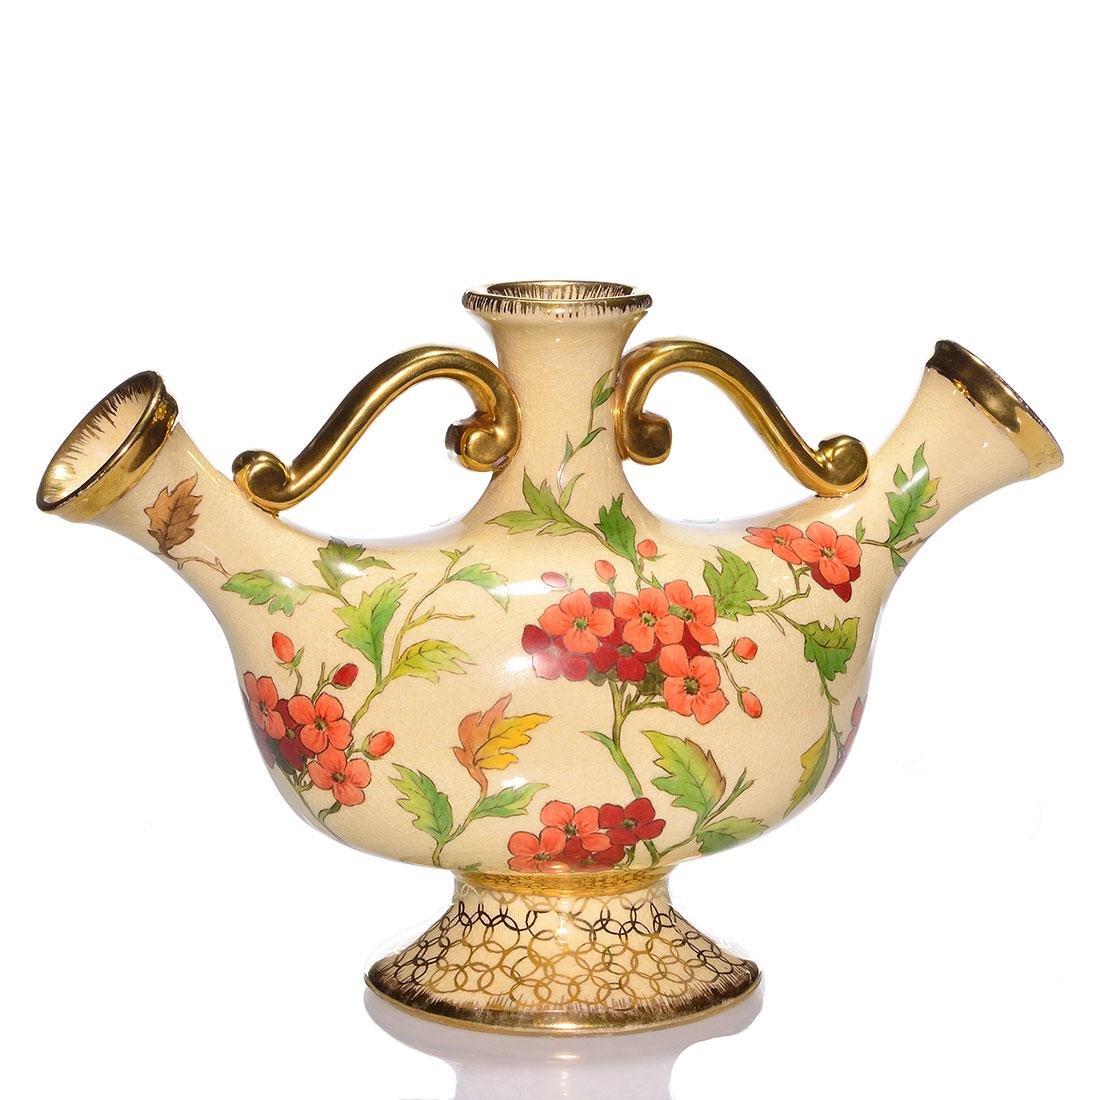 Cincinnati Art Pottery triple spout jug, red flowers, 9